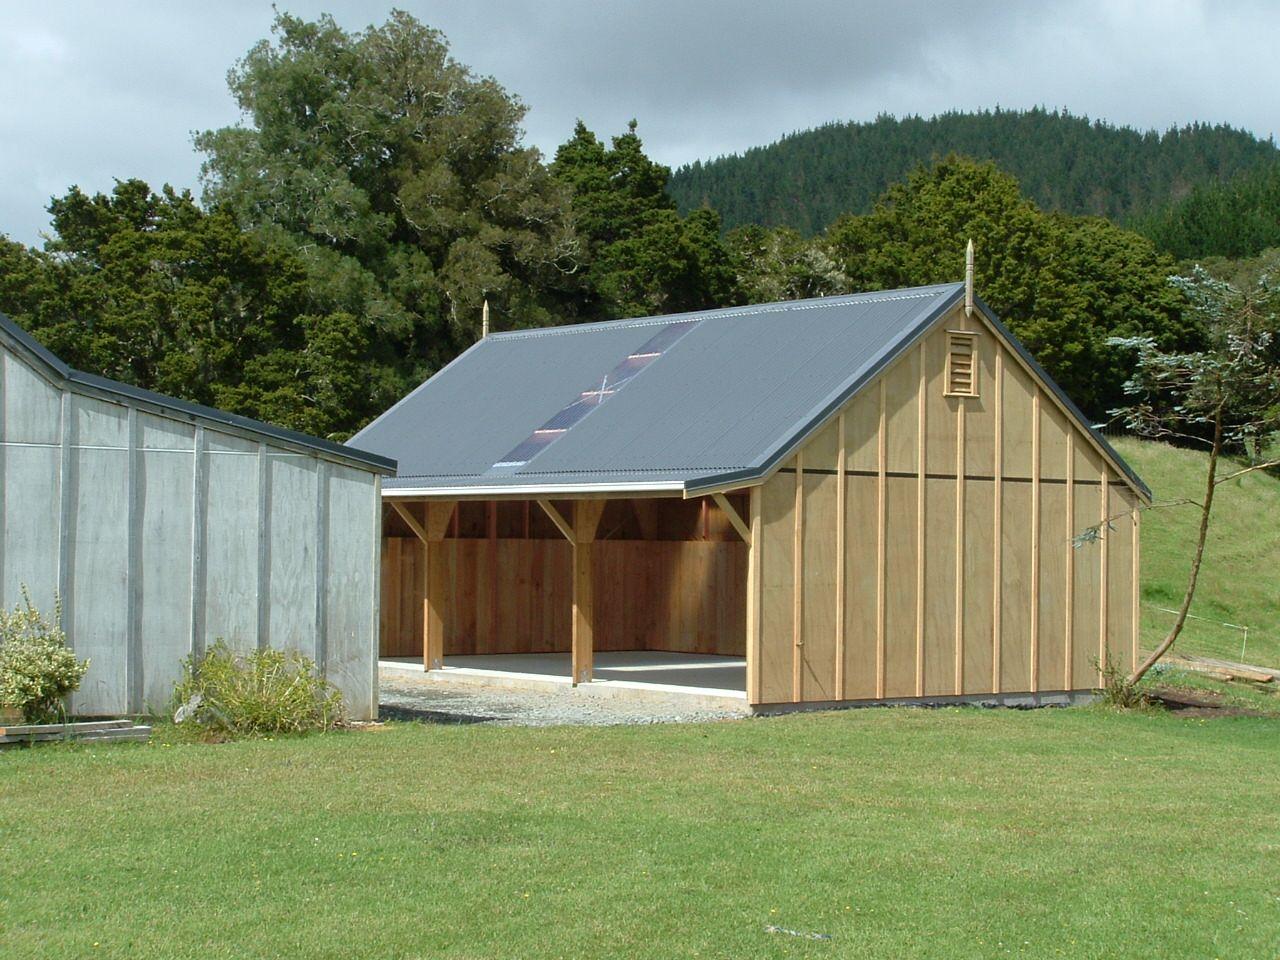 Customkit Wooden Kitset Barns, Sheds, Utility Buildings